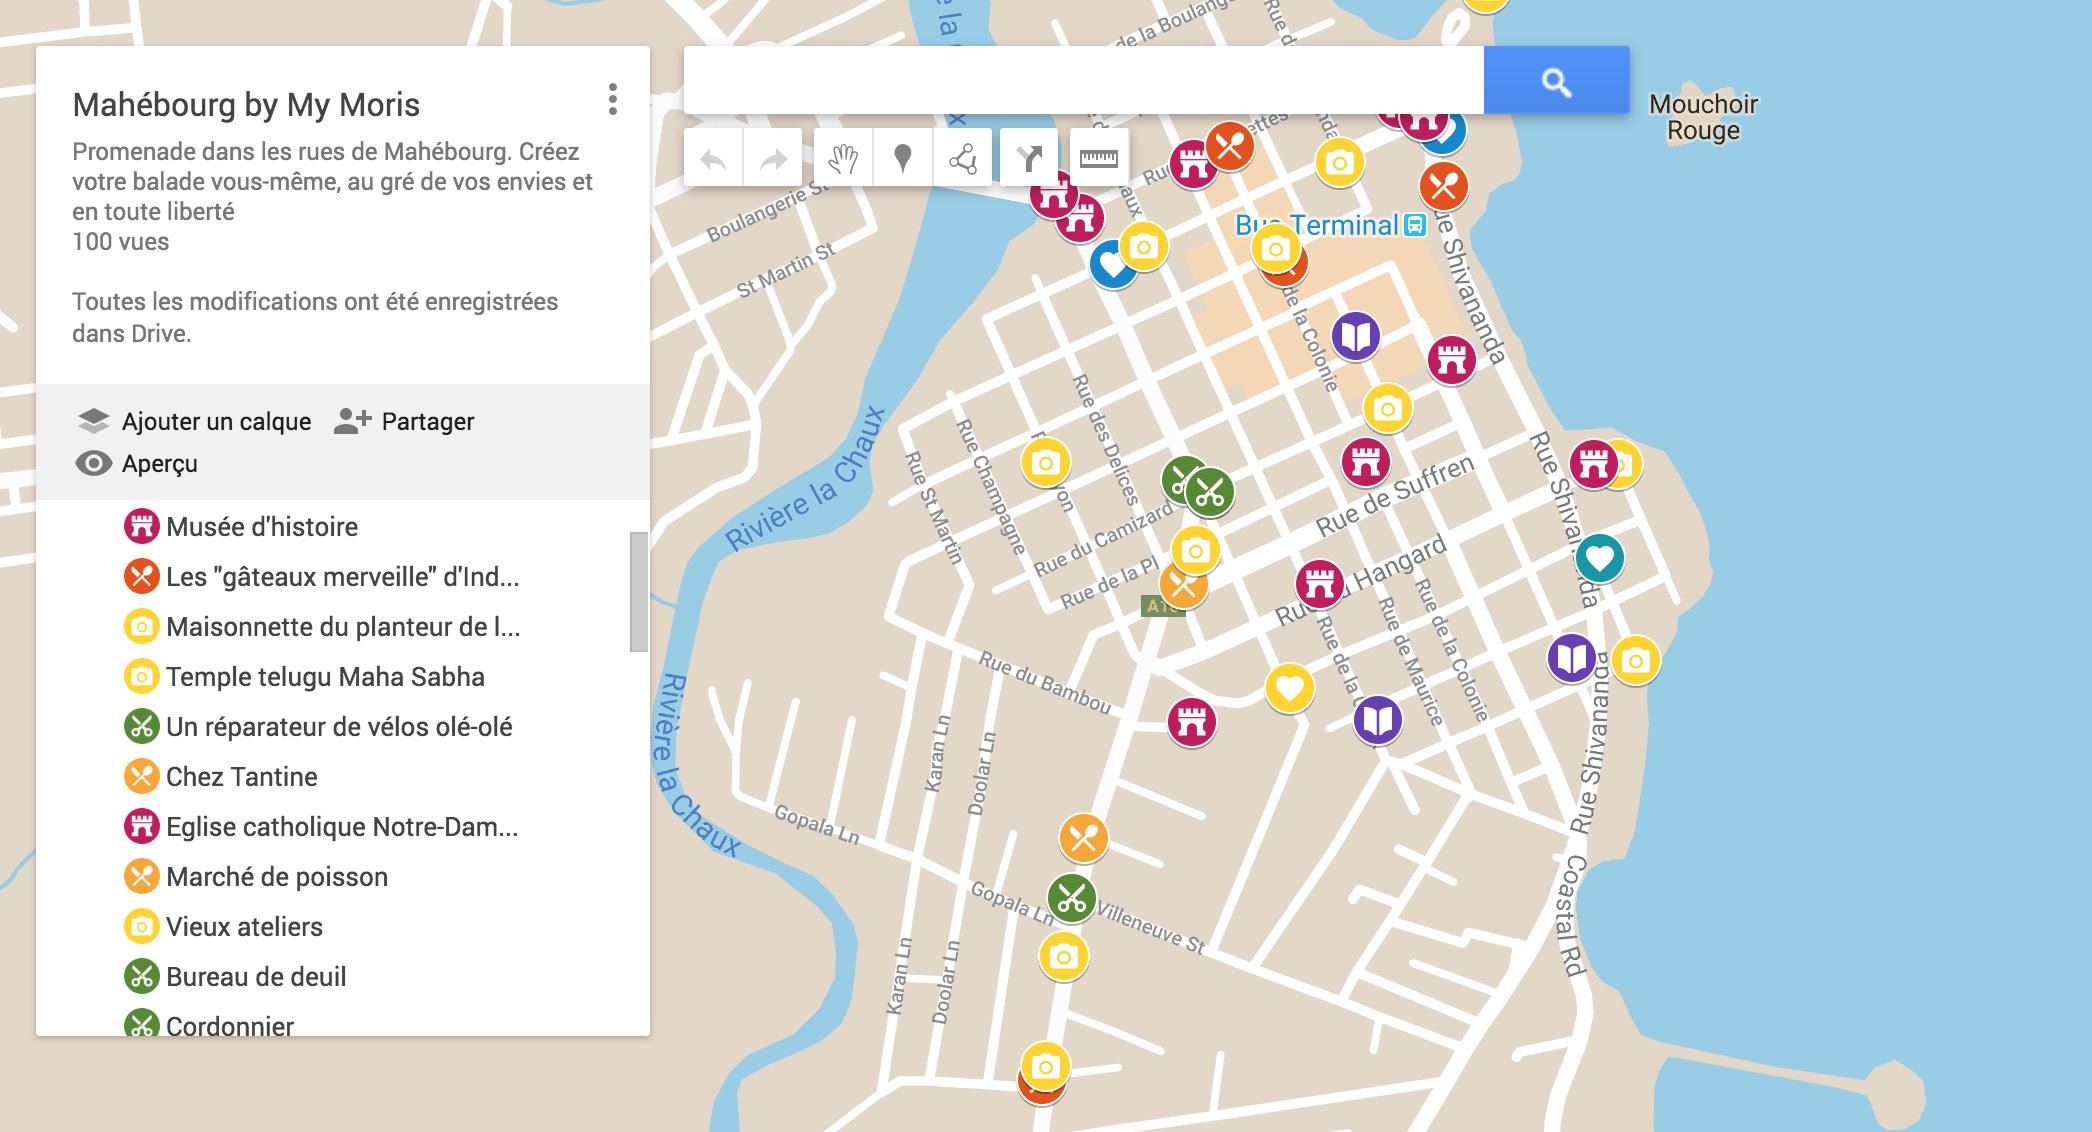 visite Mahébourg carte google balade promenade histoire culture patrimoine